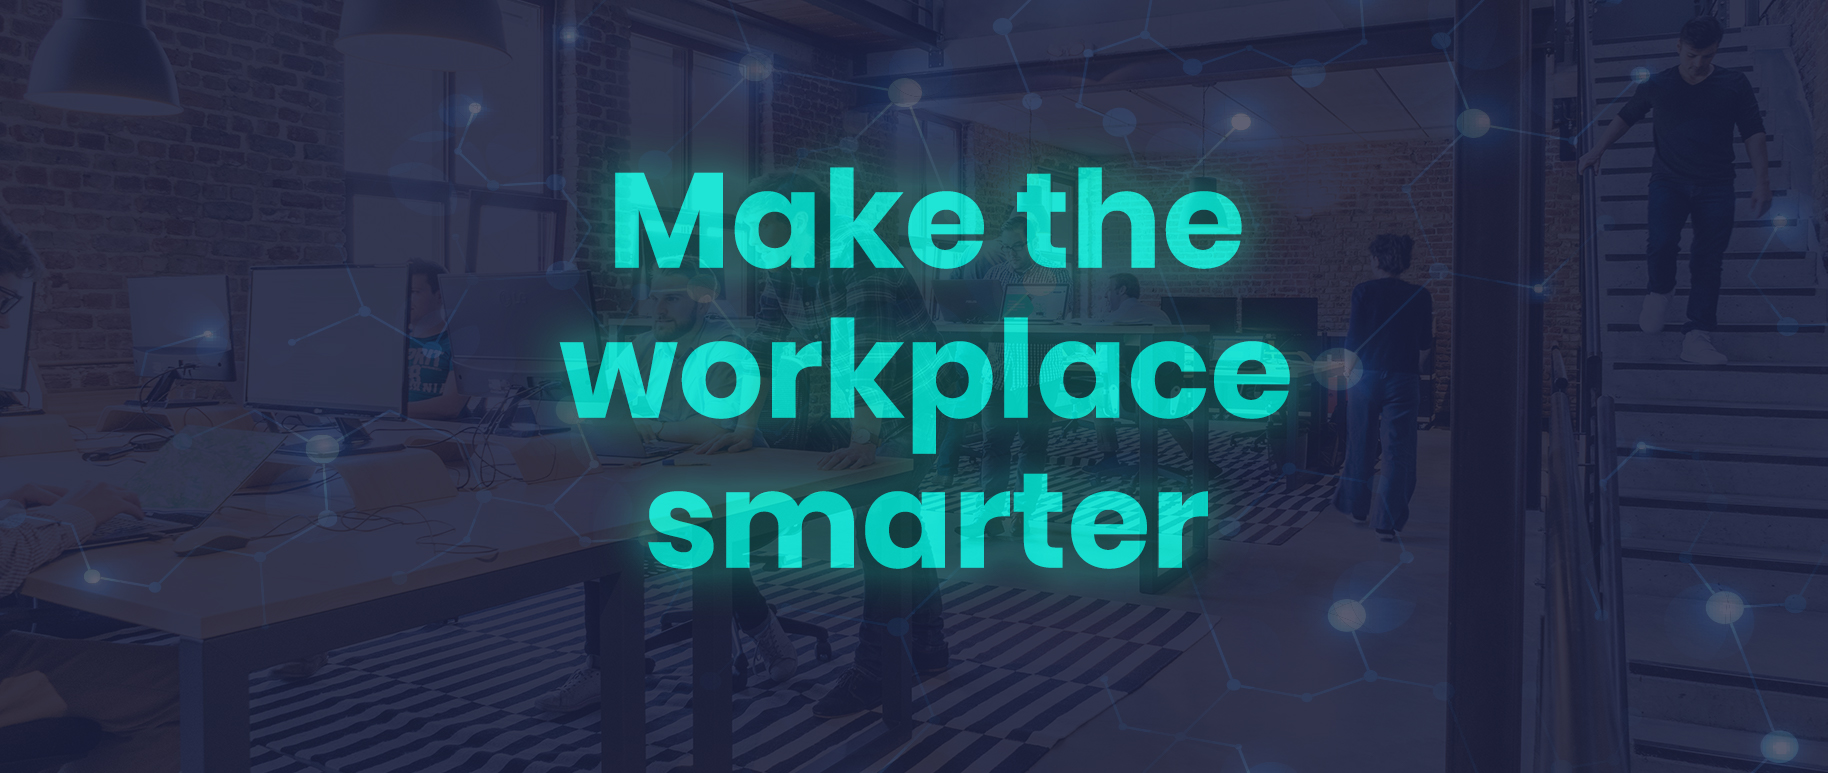 make-the-workplace-smarter